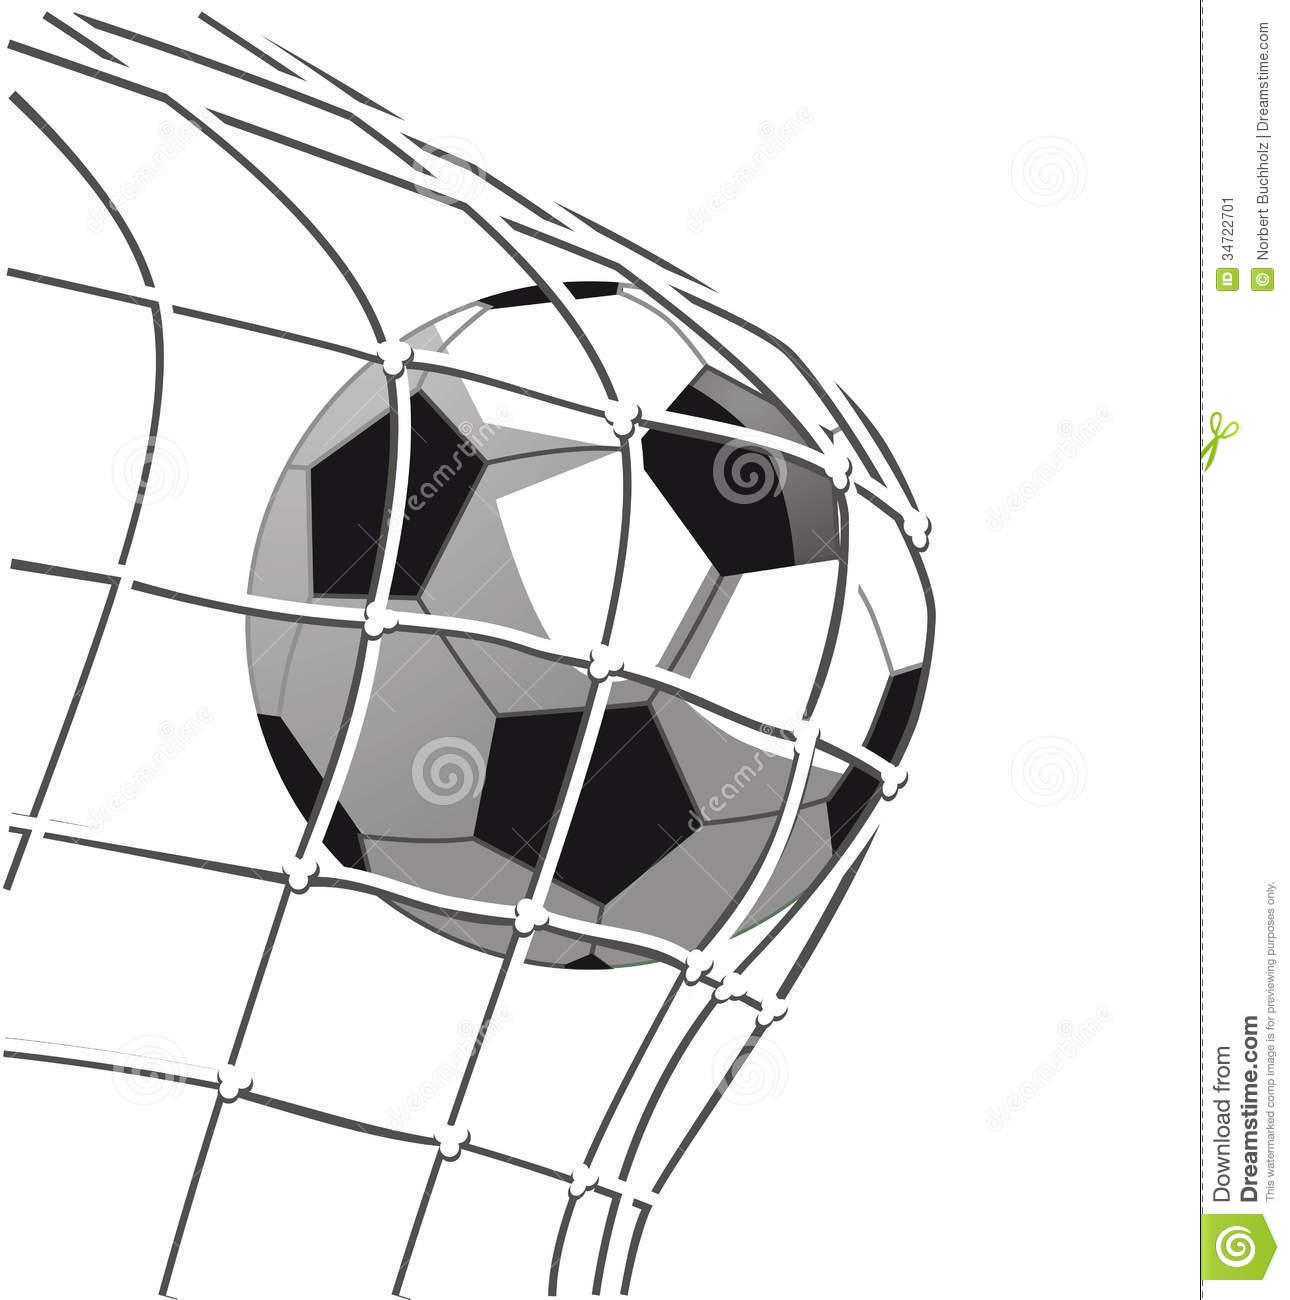 1290x1300 Soccer Goal Clip Art Many Interesting Cliparts